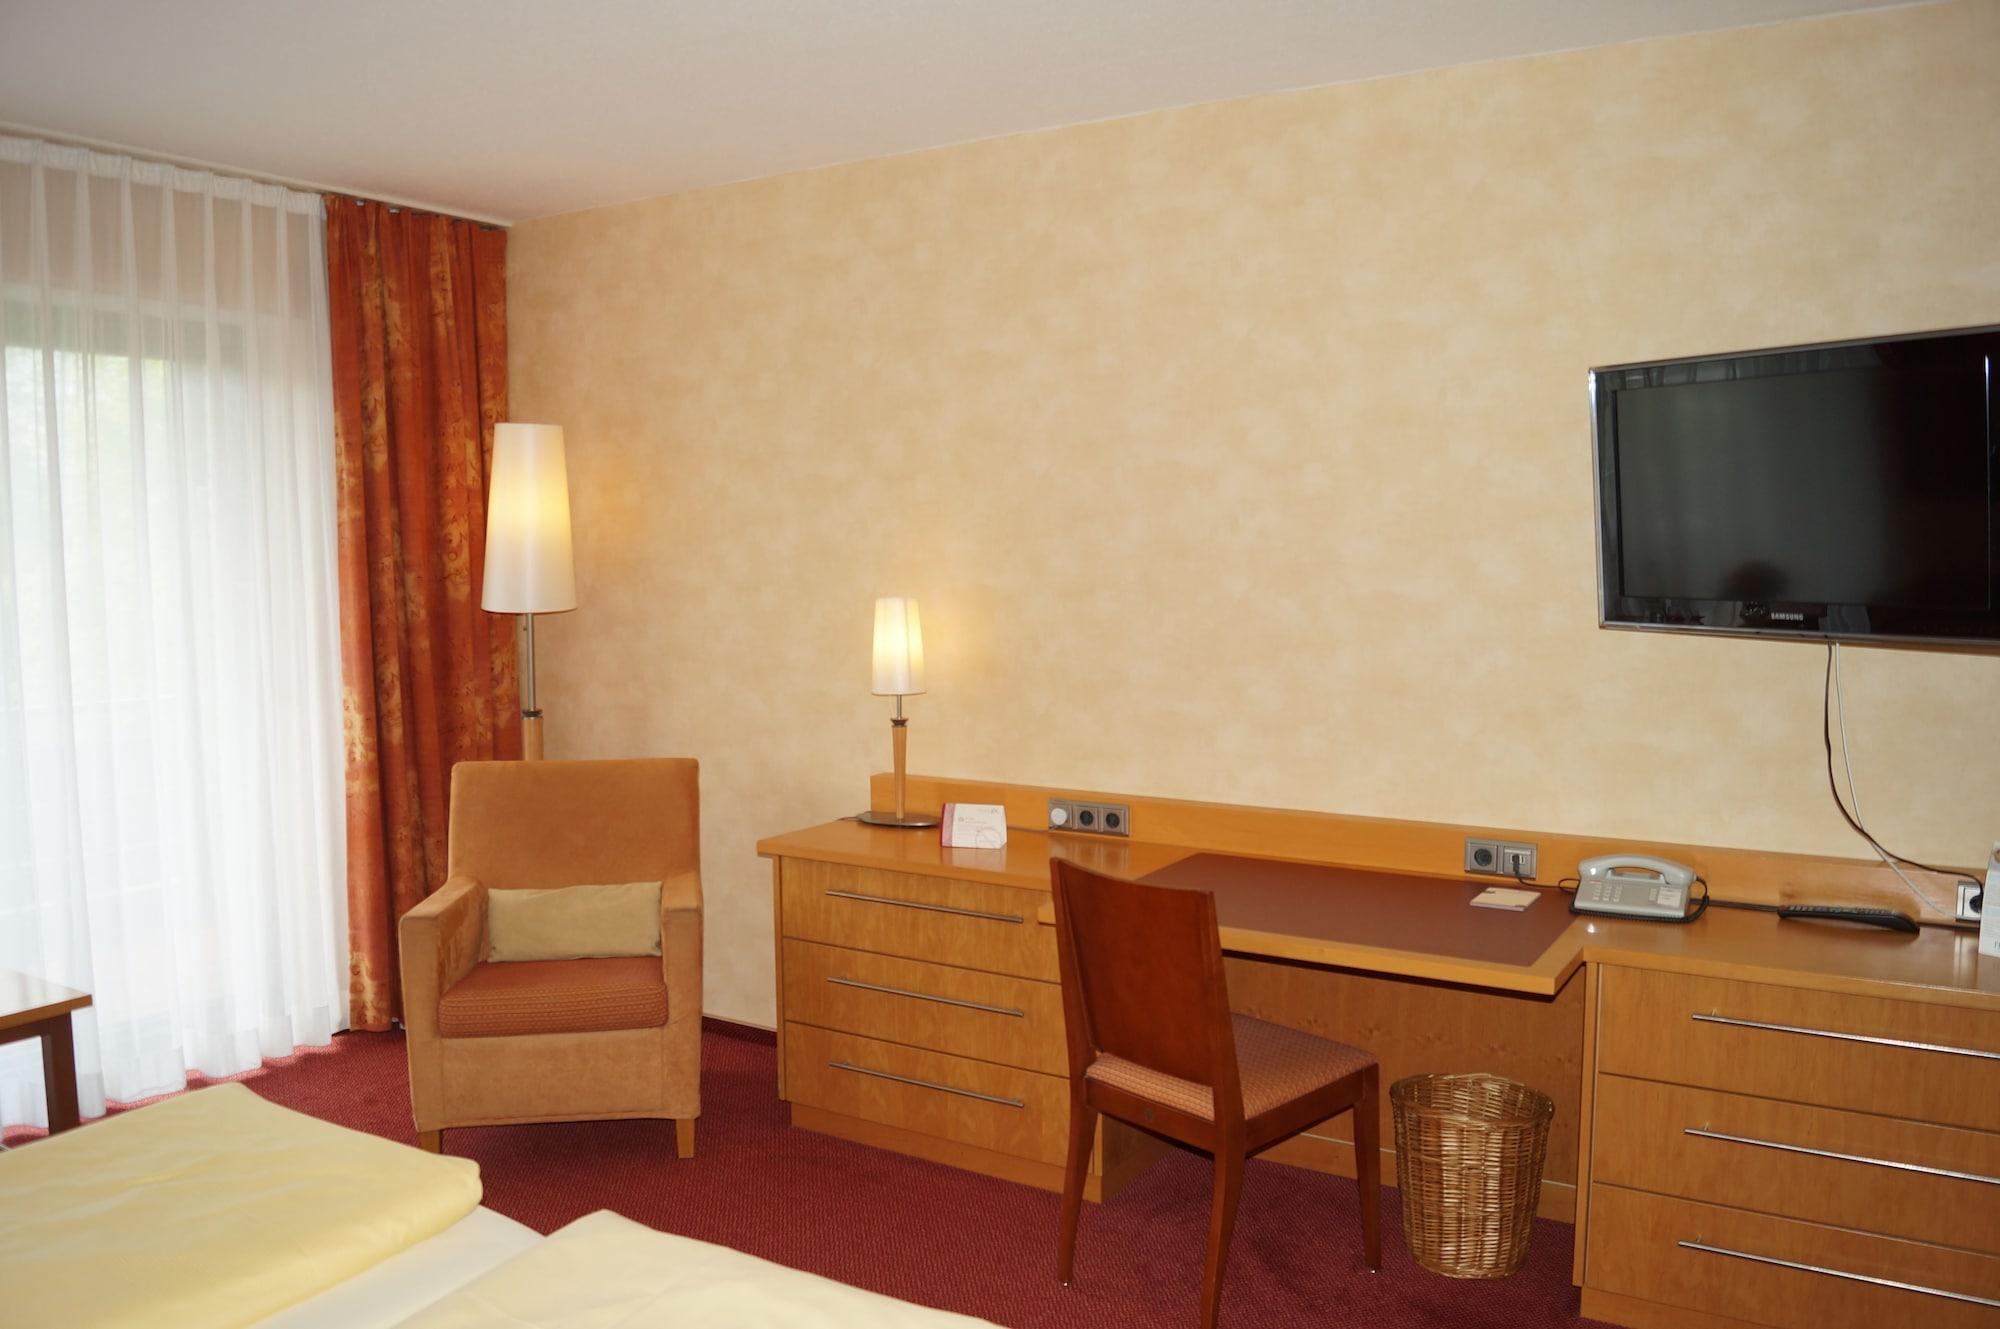 Hotel an der Ilse, Lippe